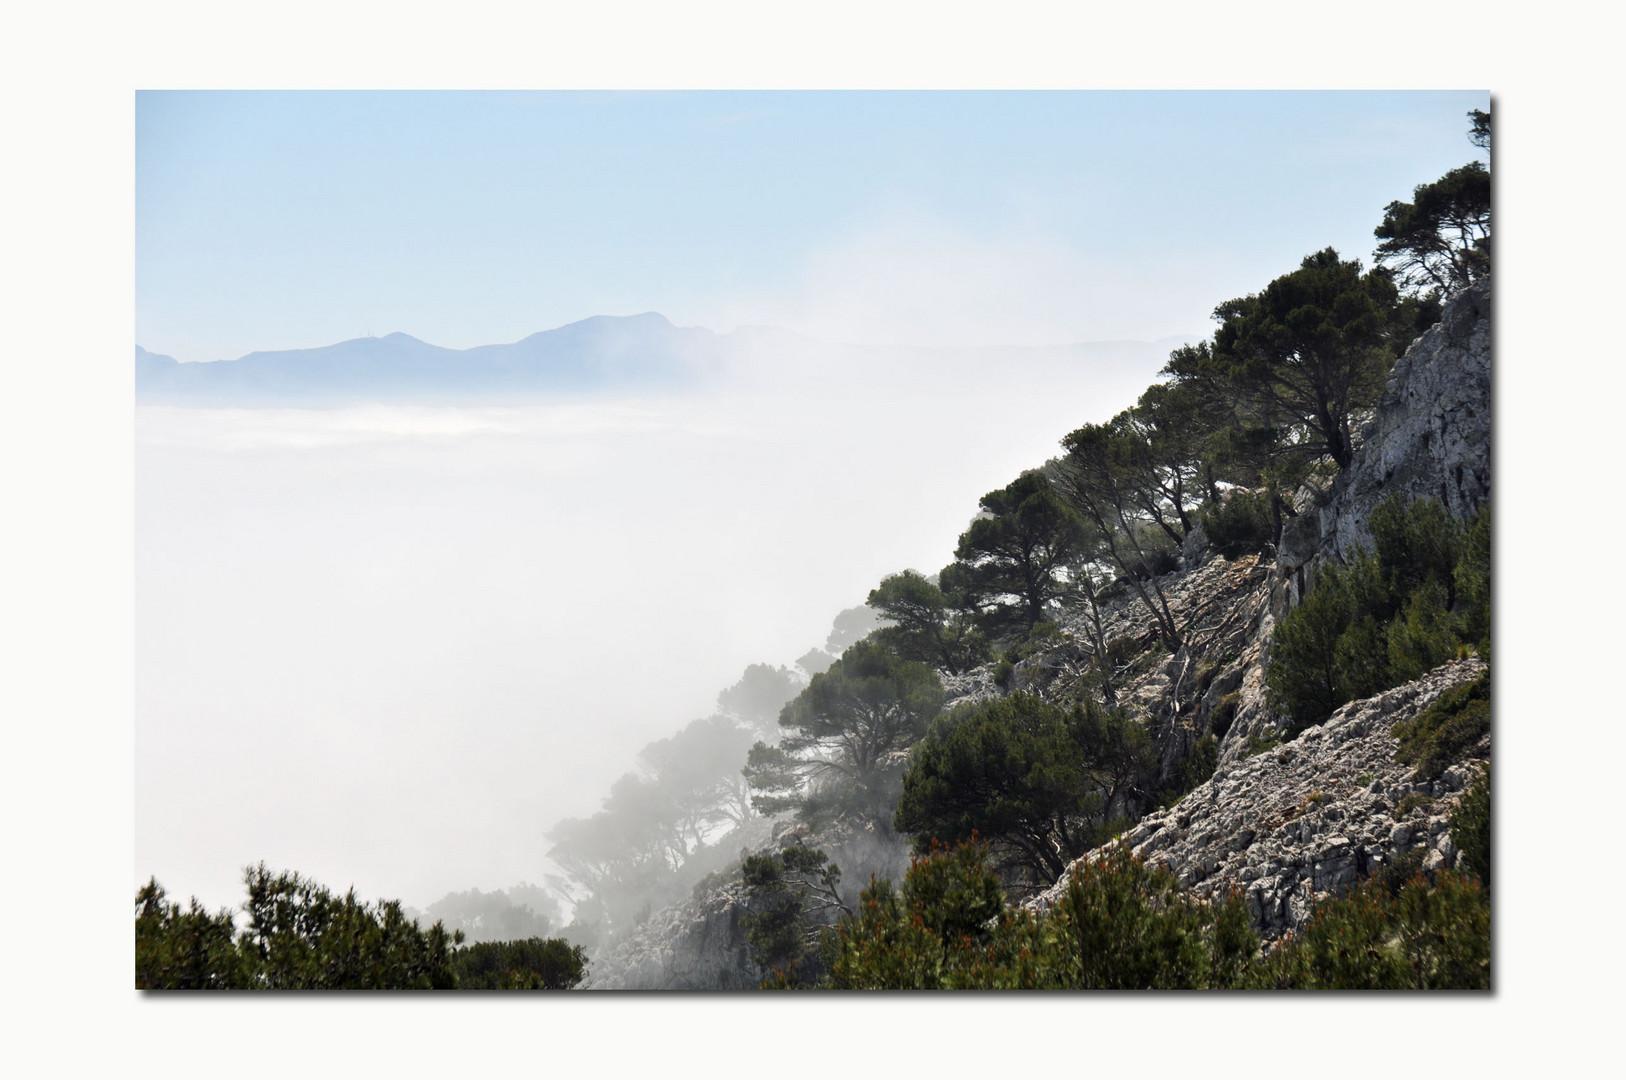 Nebelbildung